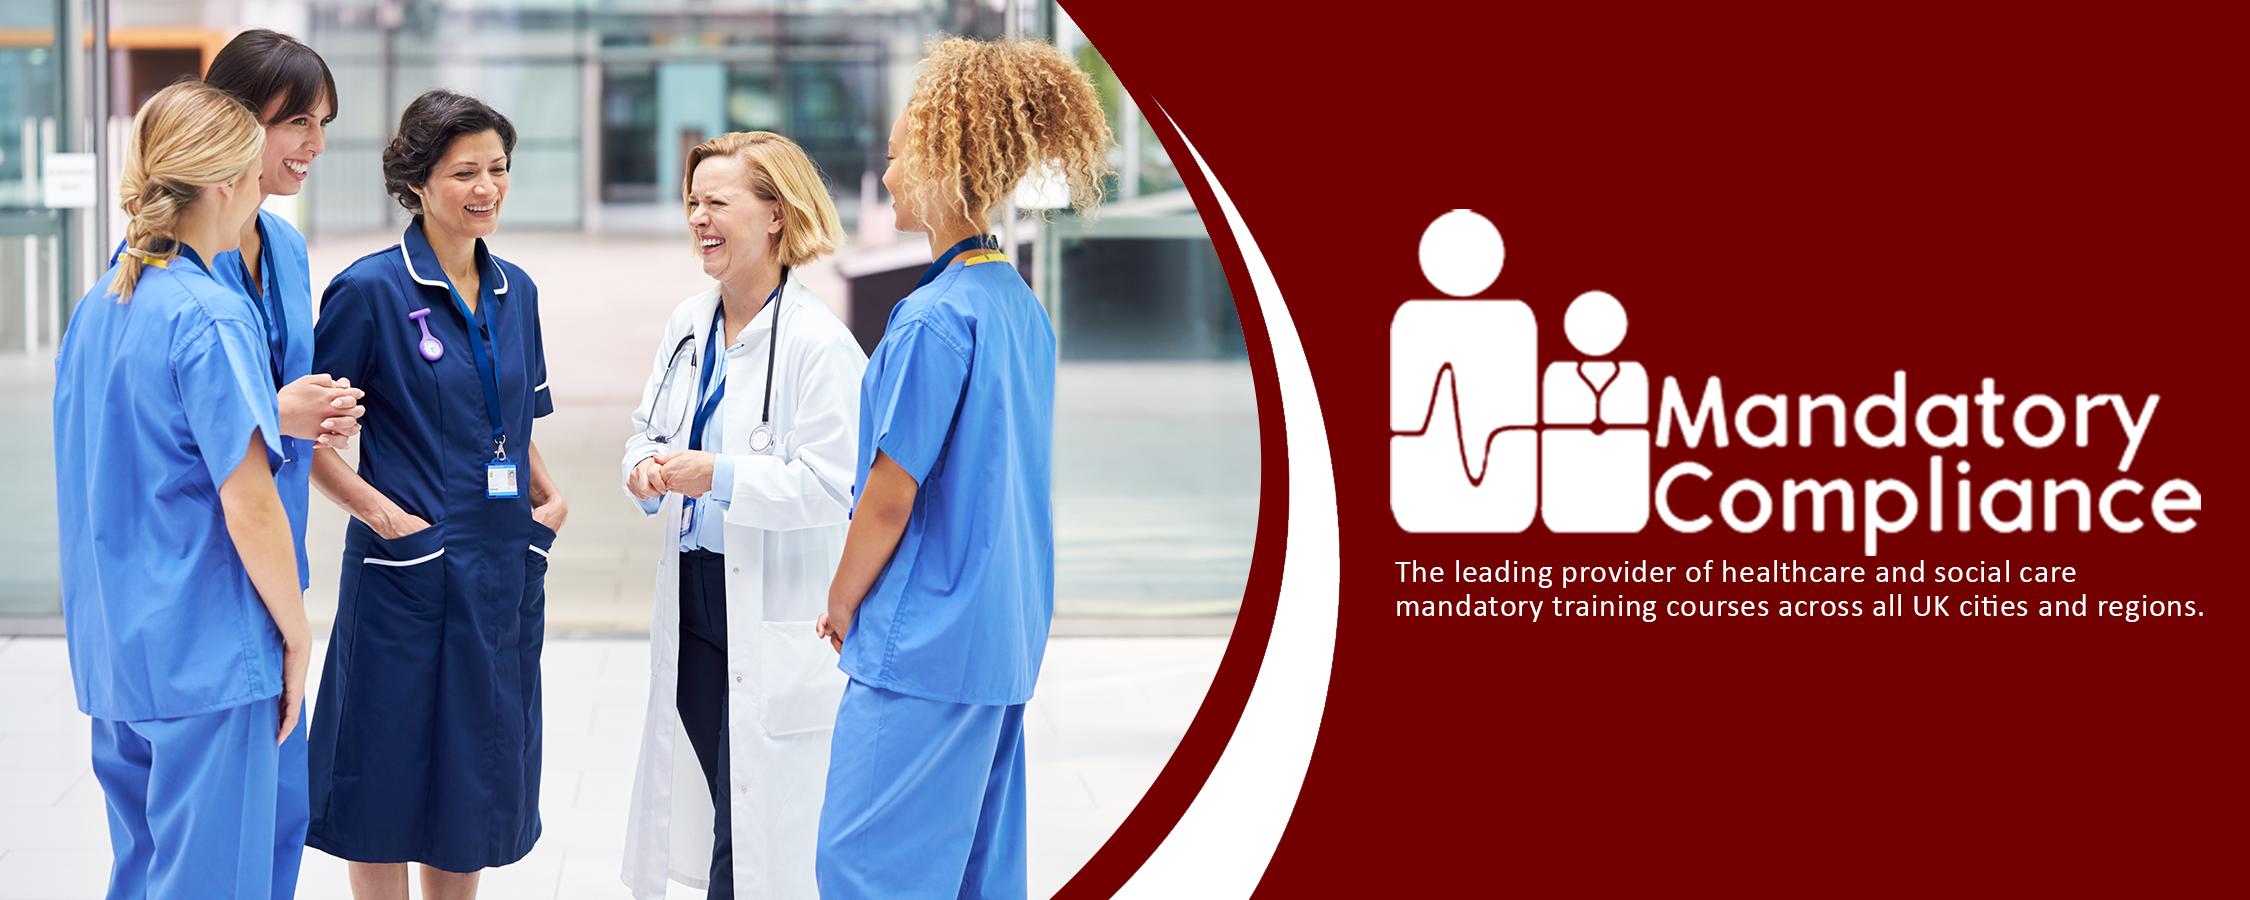 First Aid Training – Level 2 - E-Learning Courses - Mandatory Compliance UK -